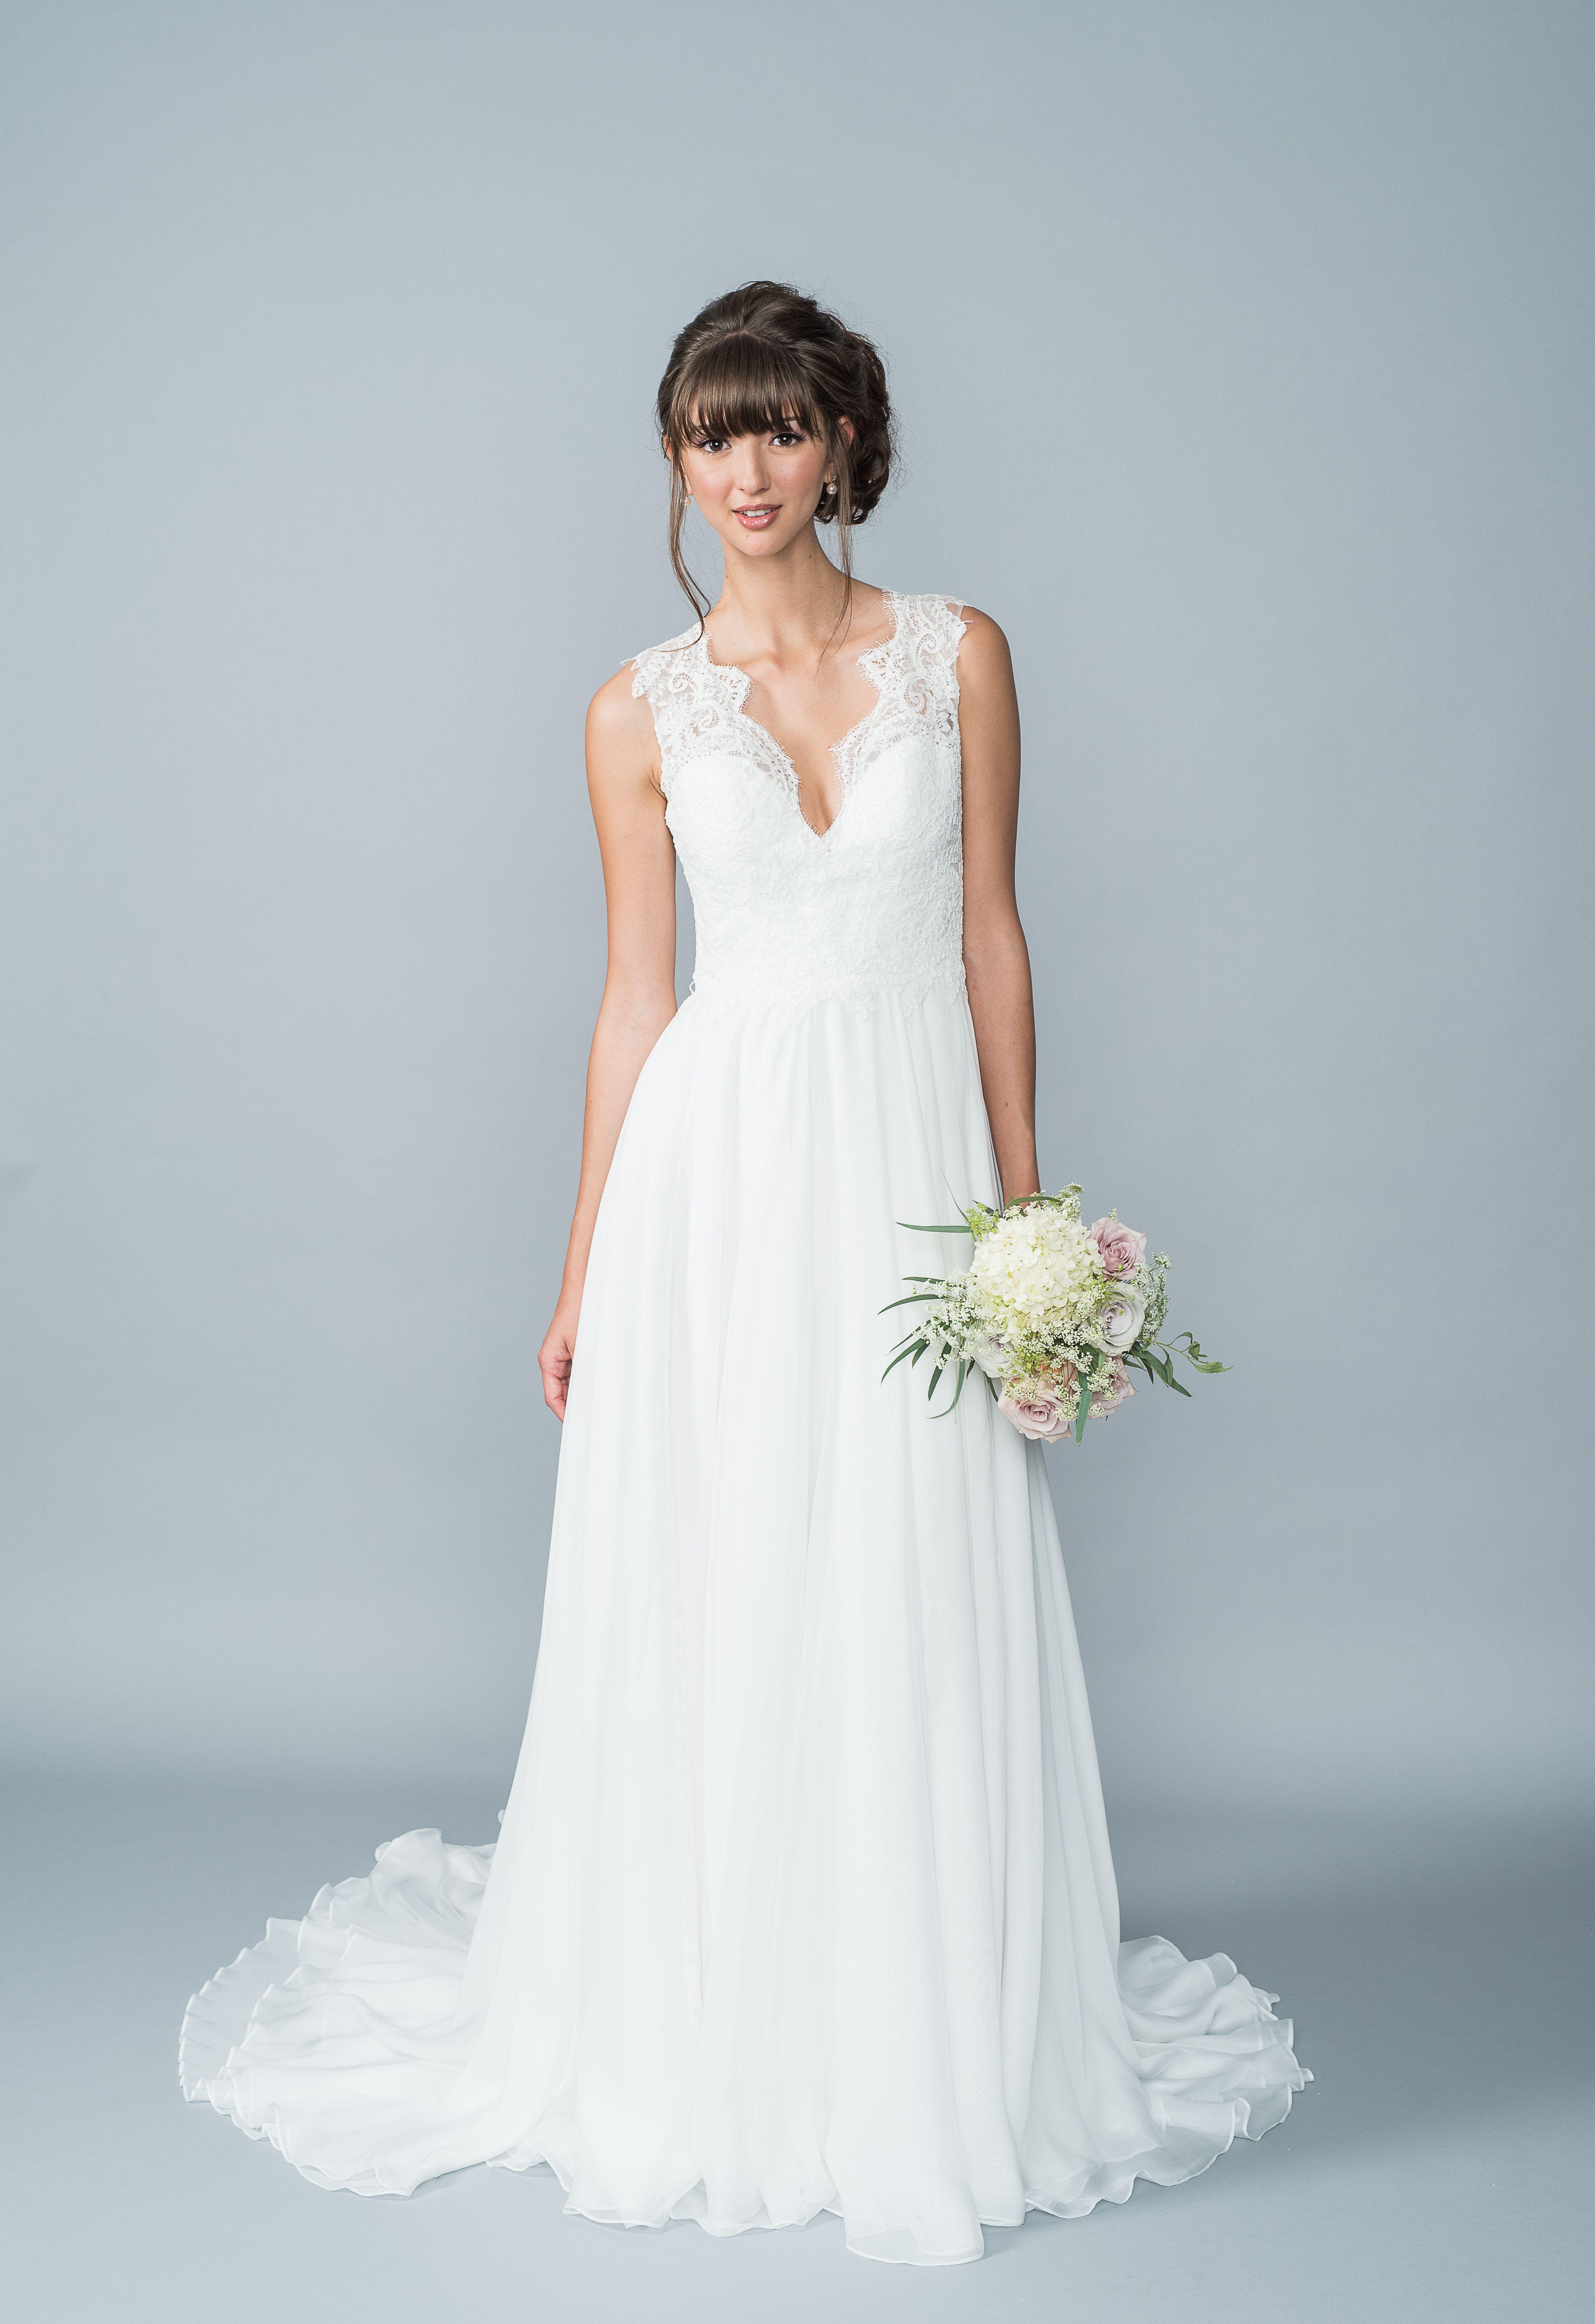 1000 ideas about lis simon wedding dresses on pinterest for Plus size wedding dresses second marriage